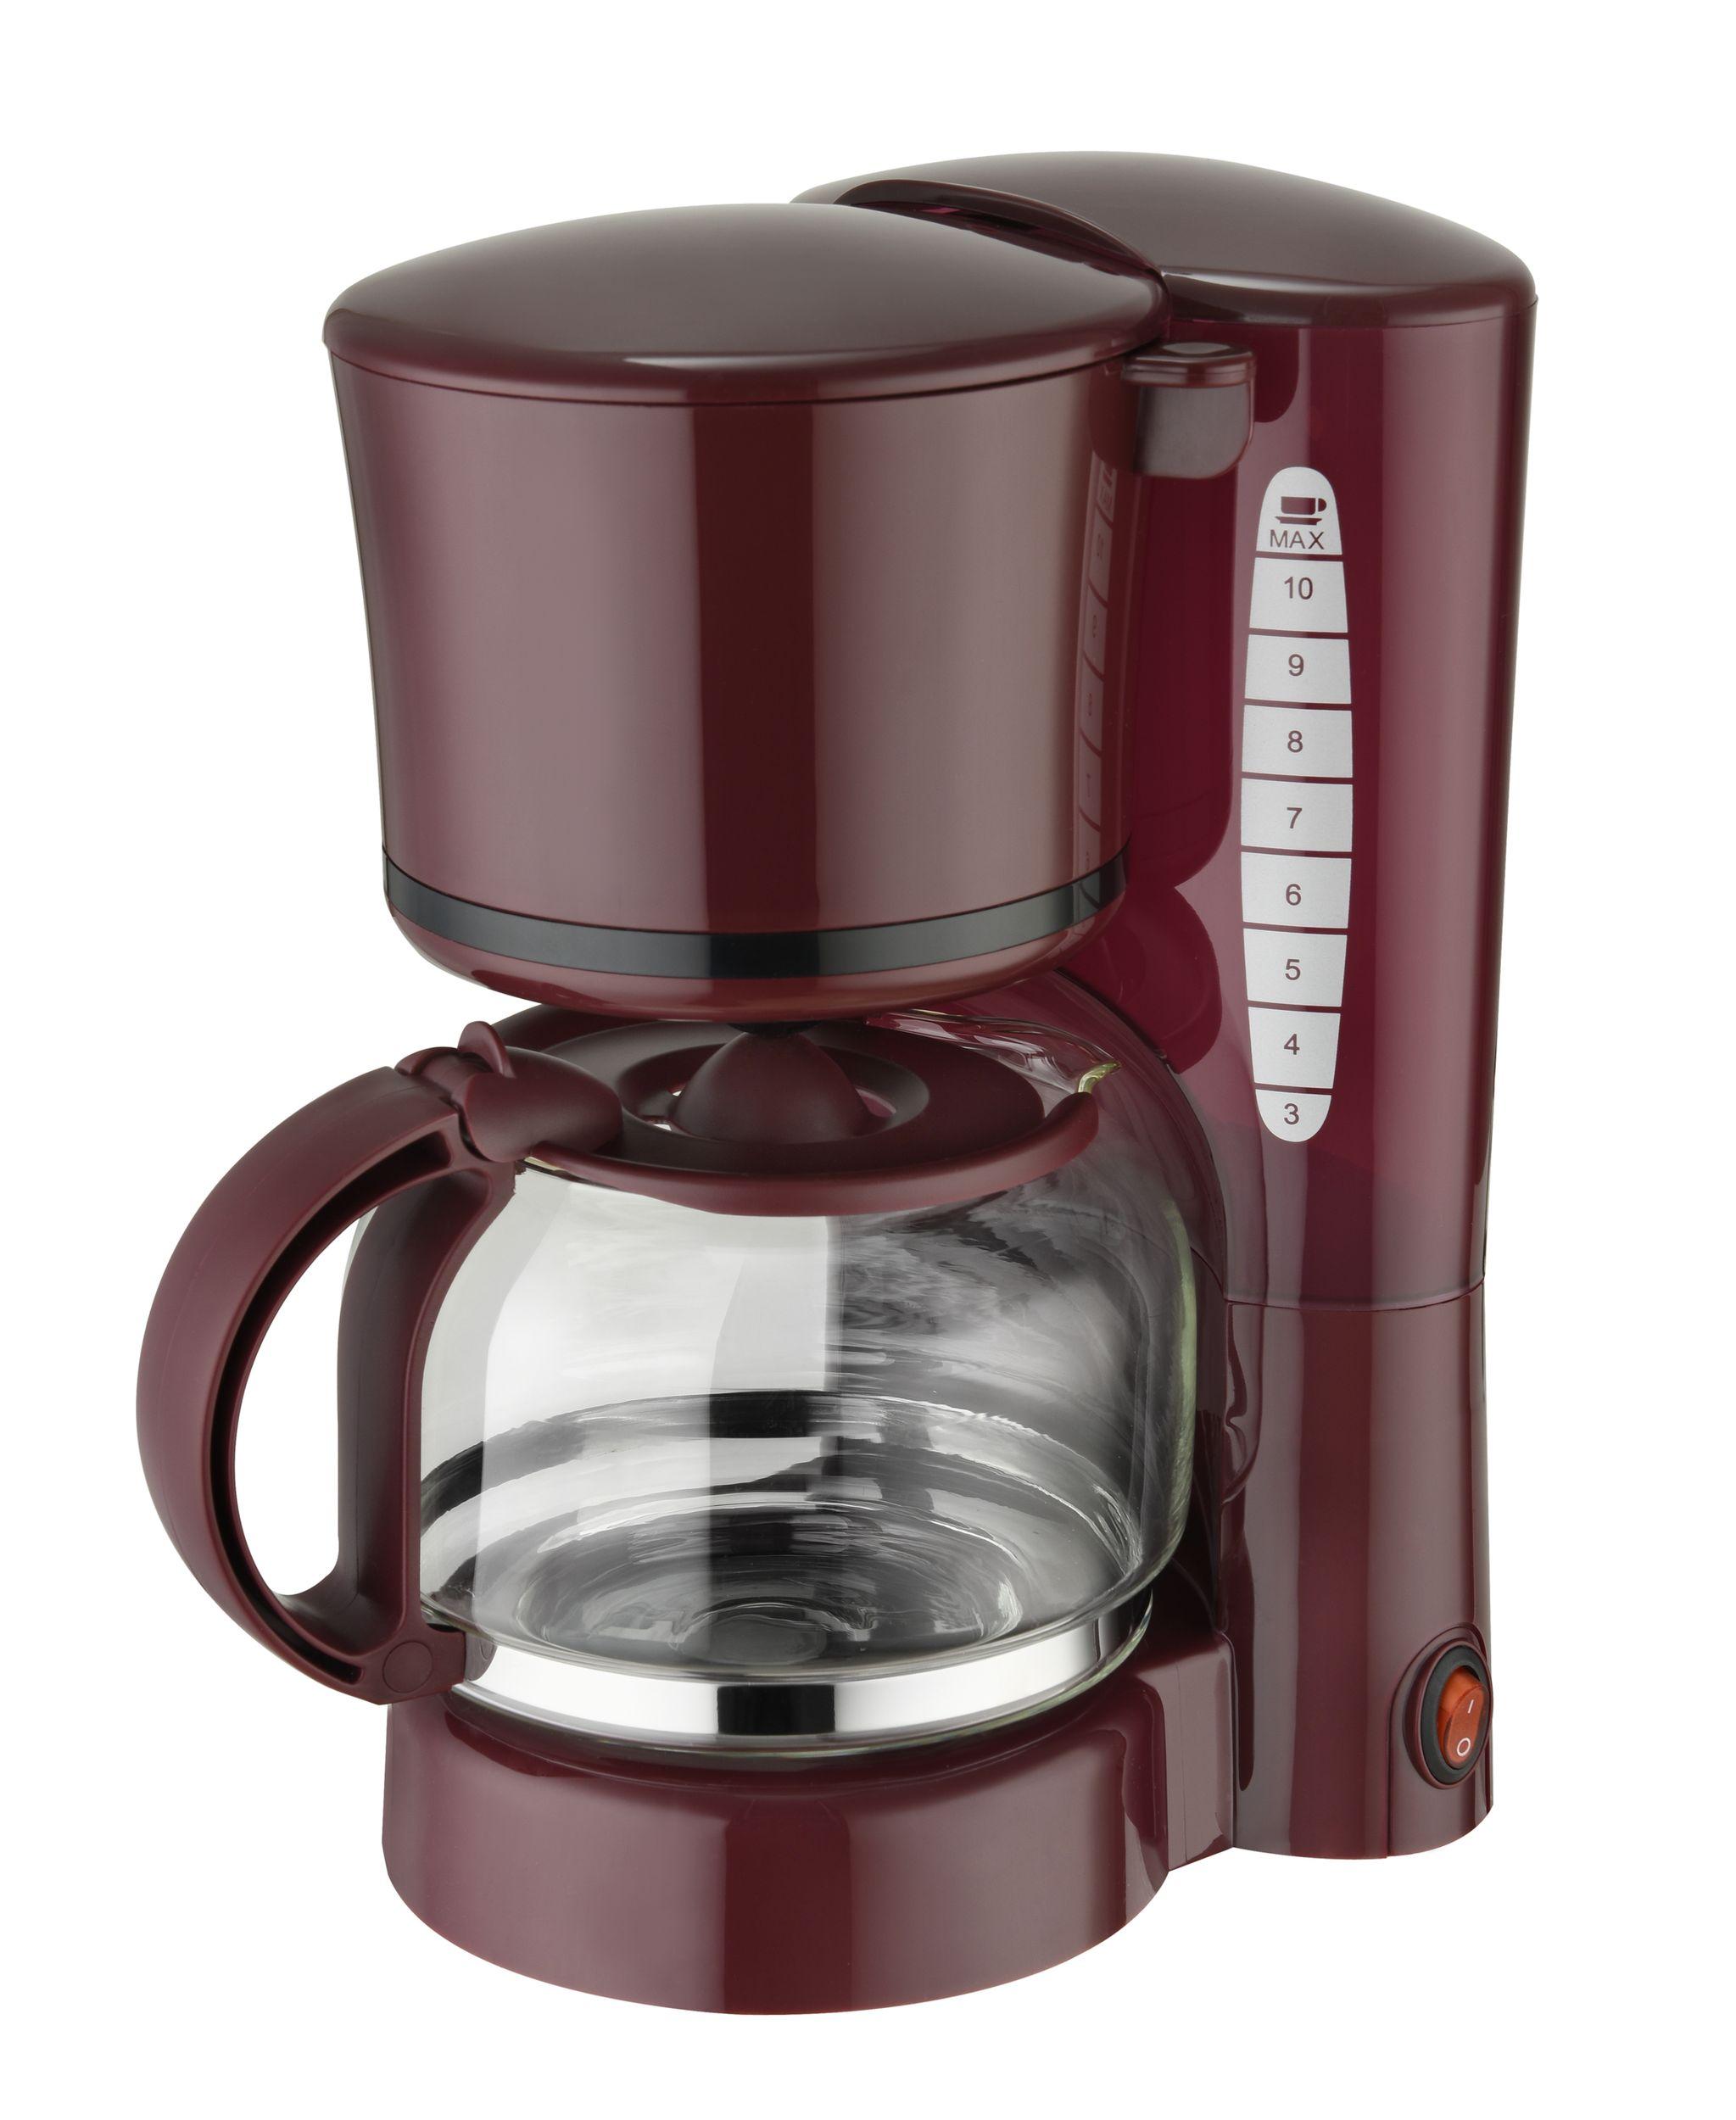 Frühstücksset 3-teilig Toaster Wasserkocher 1 Liter Kaffeemaschine 1,25 Liter Weinrot Bordeaux Bild 4